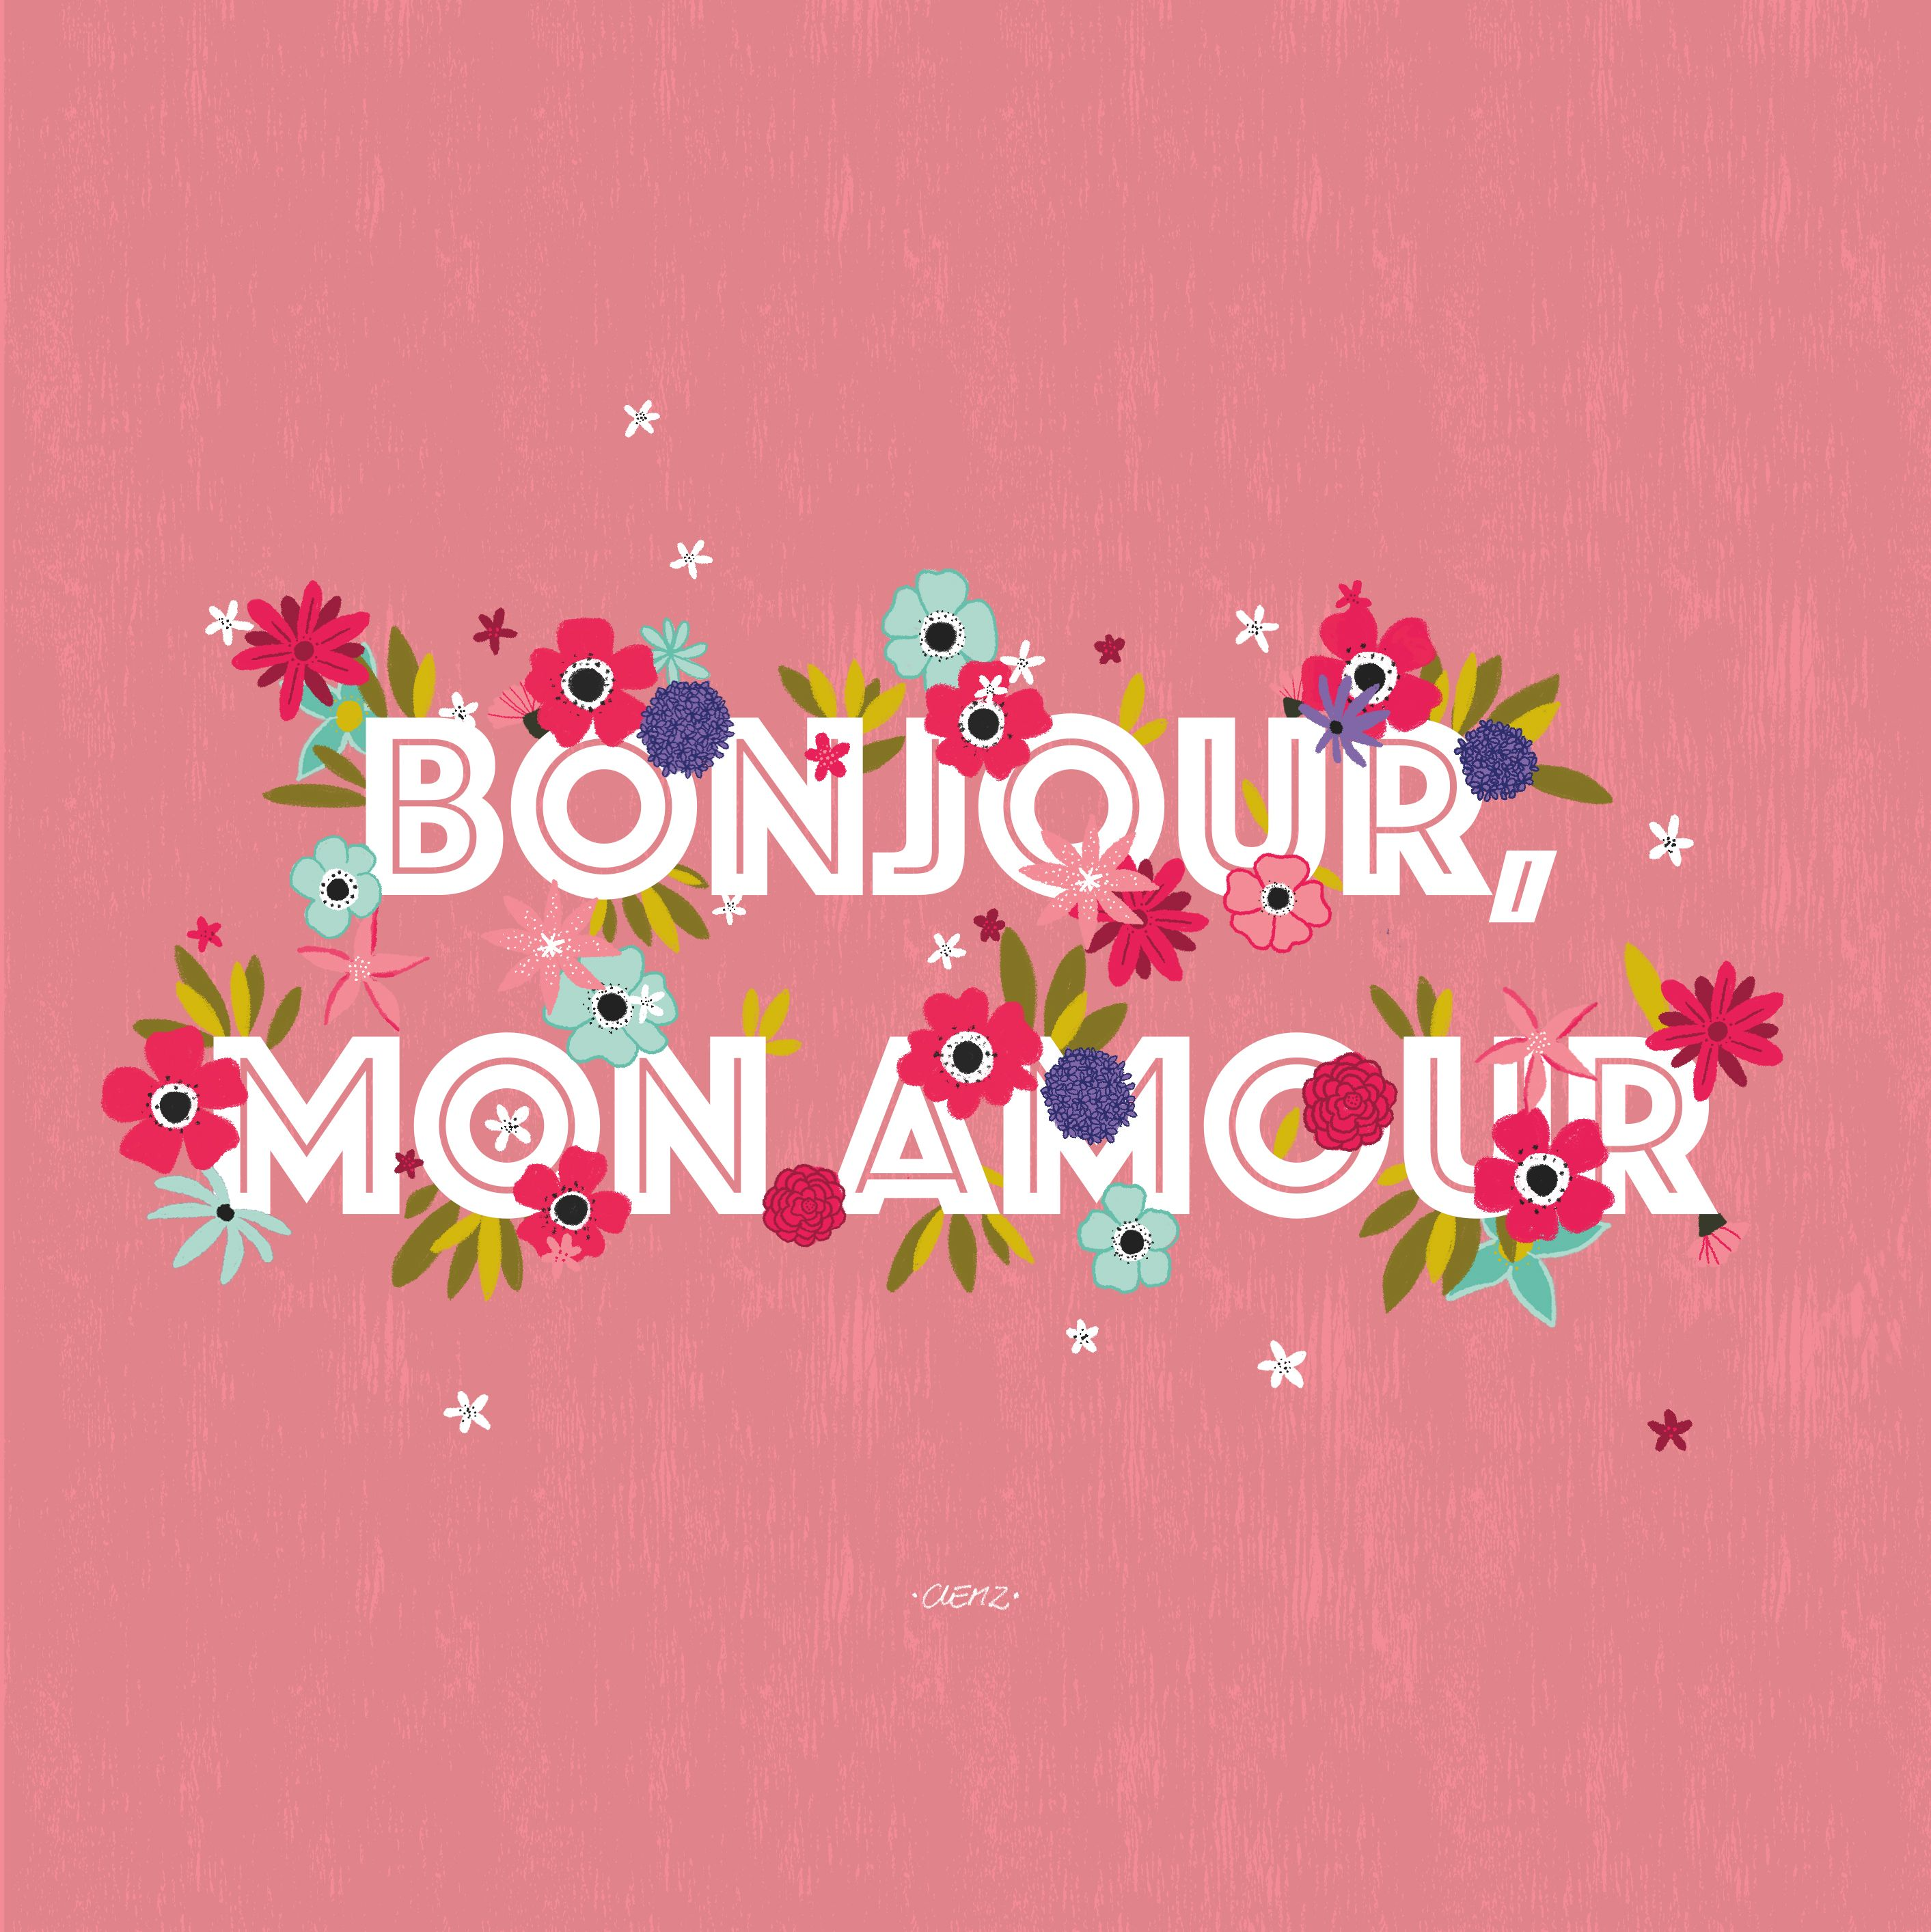 Illustration Fleurie Bonjour Mon Amour At Clemzillu Good